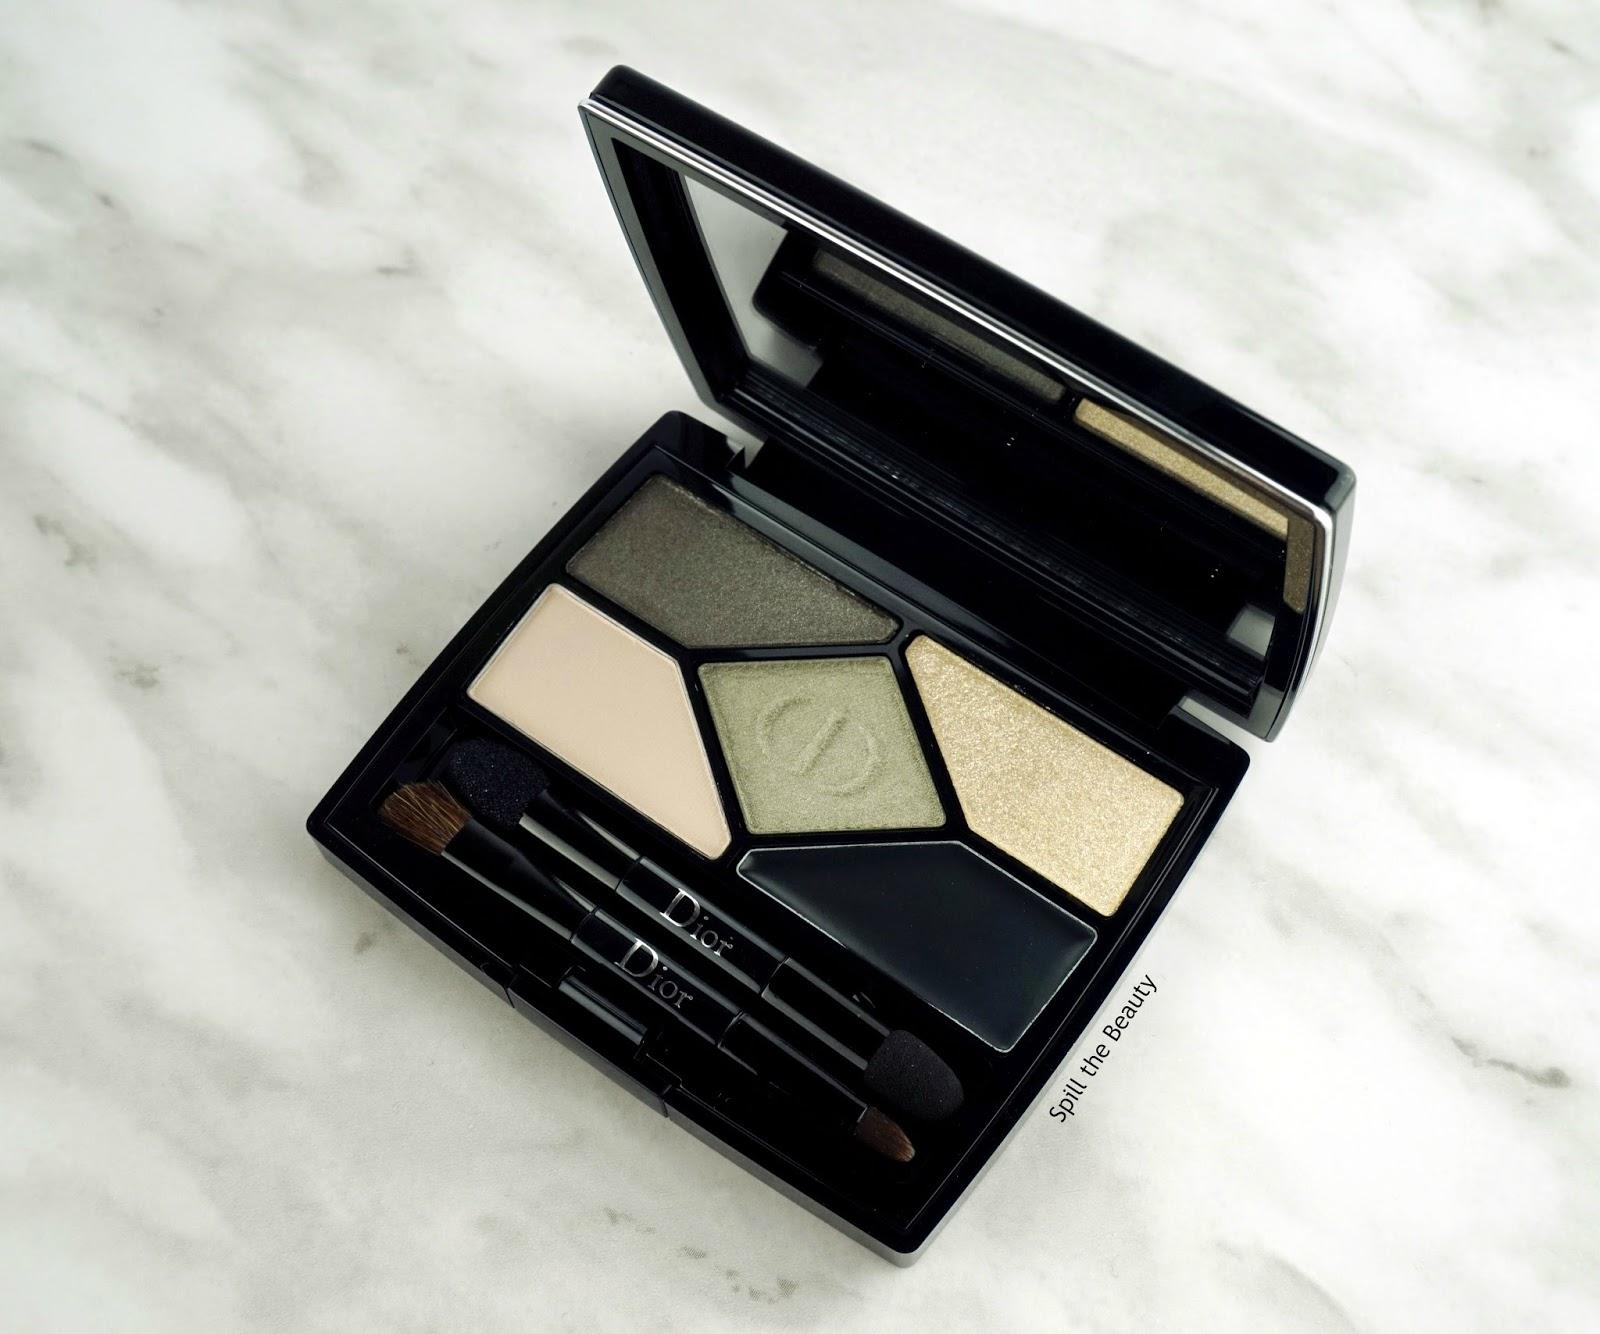 Dior 5 Couleurs Designer Palette in 'Khaki Design'